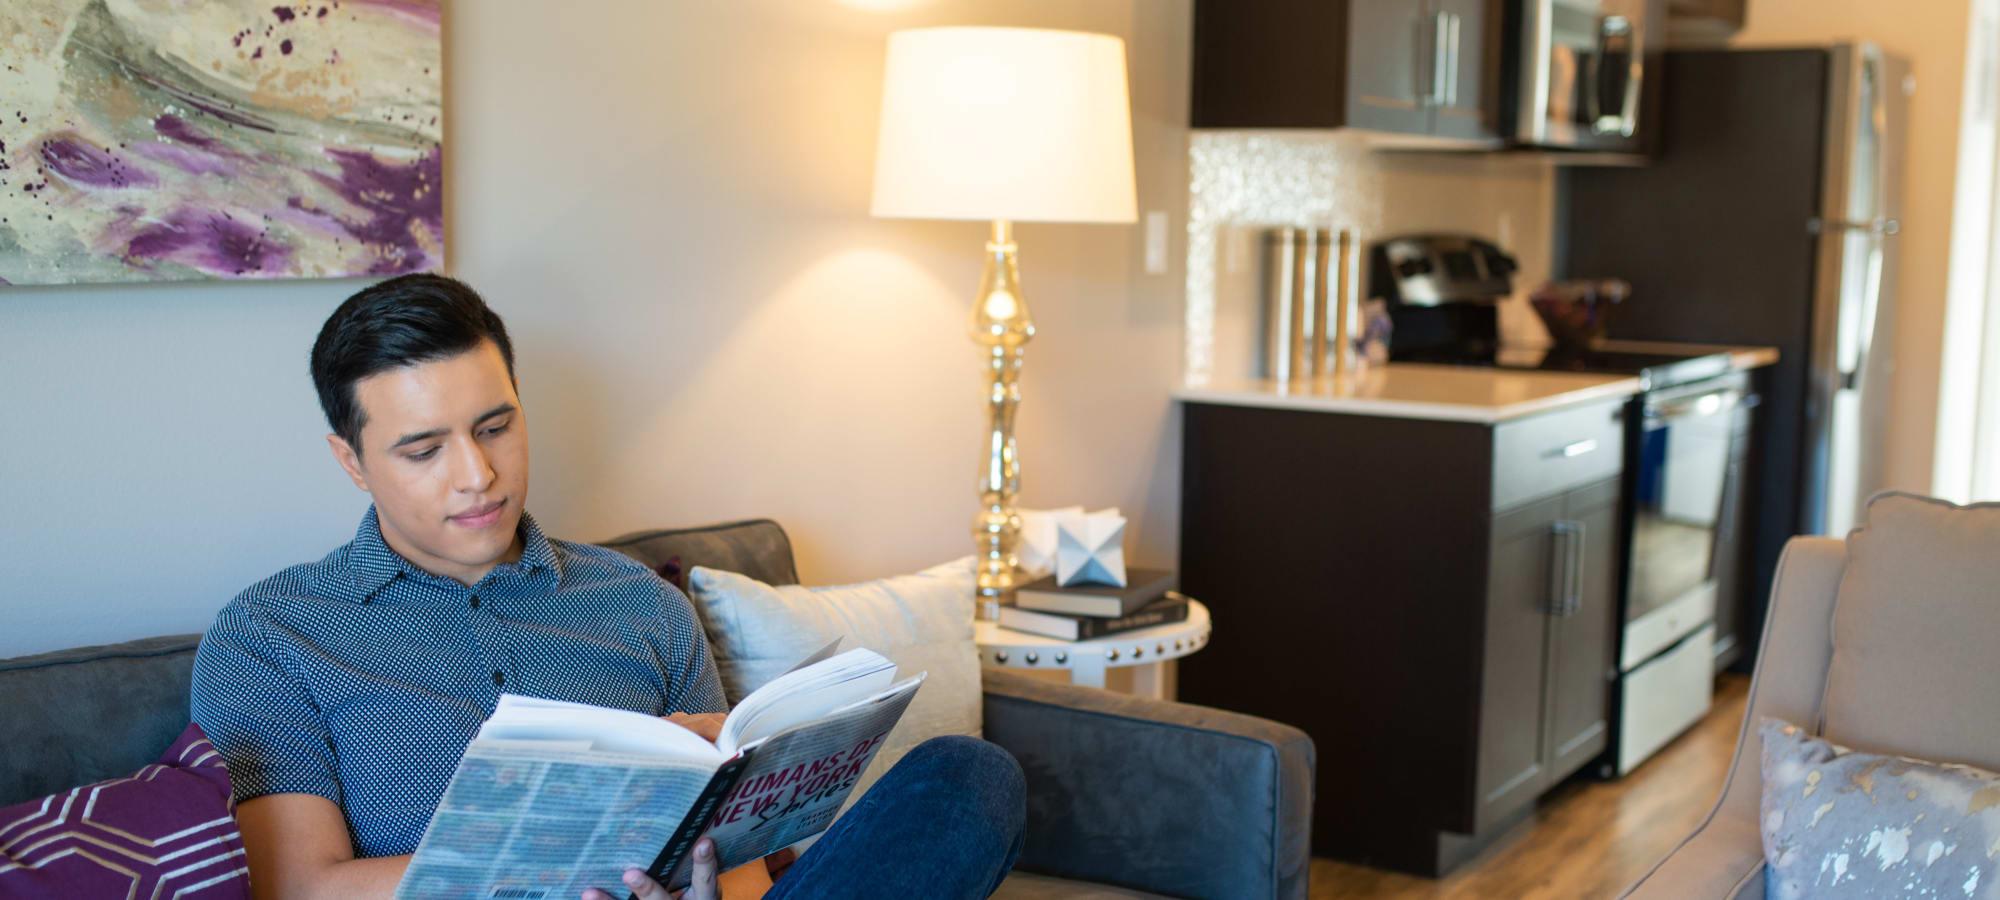 Spacious living area in model home at Villa Vita Apartments in Peoria, Arizona